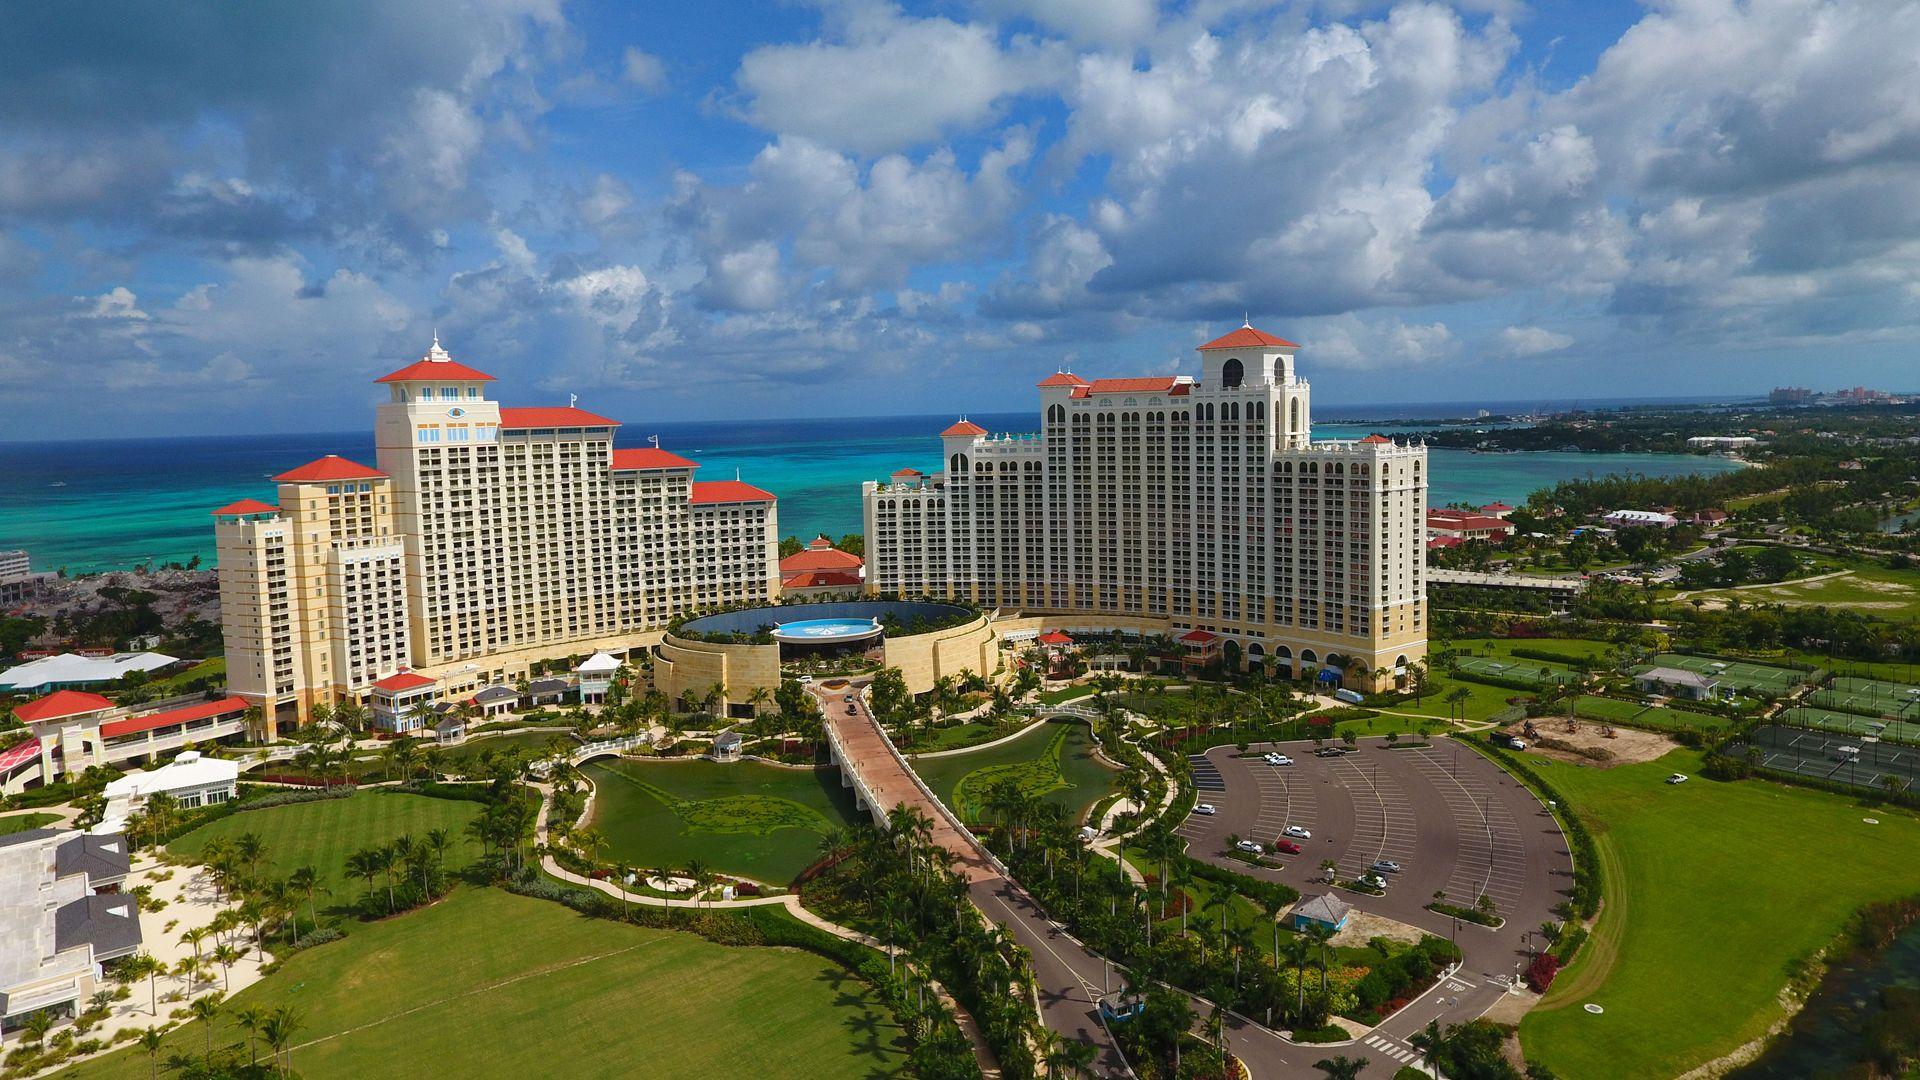 Baha Mar Resort